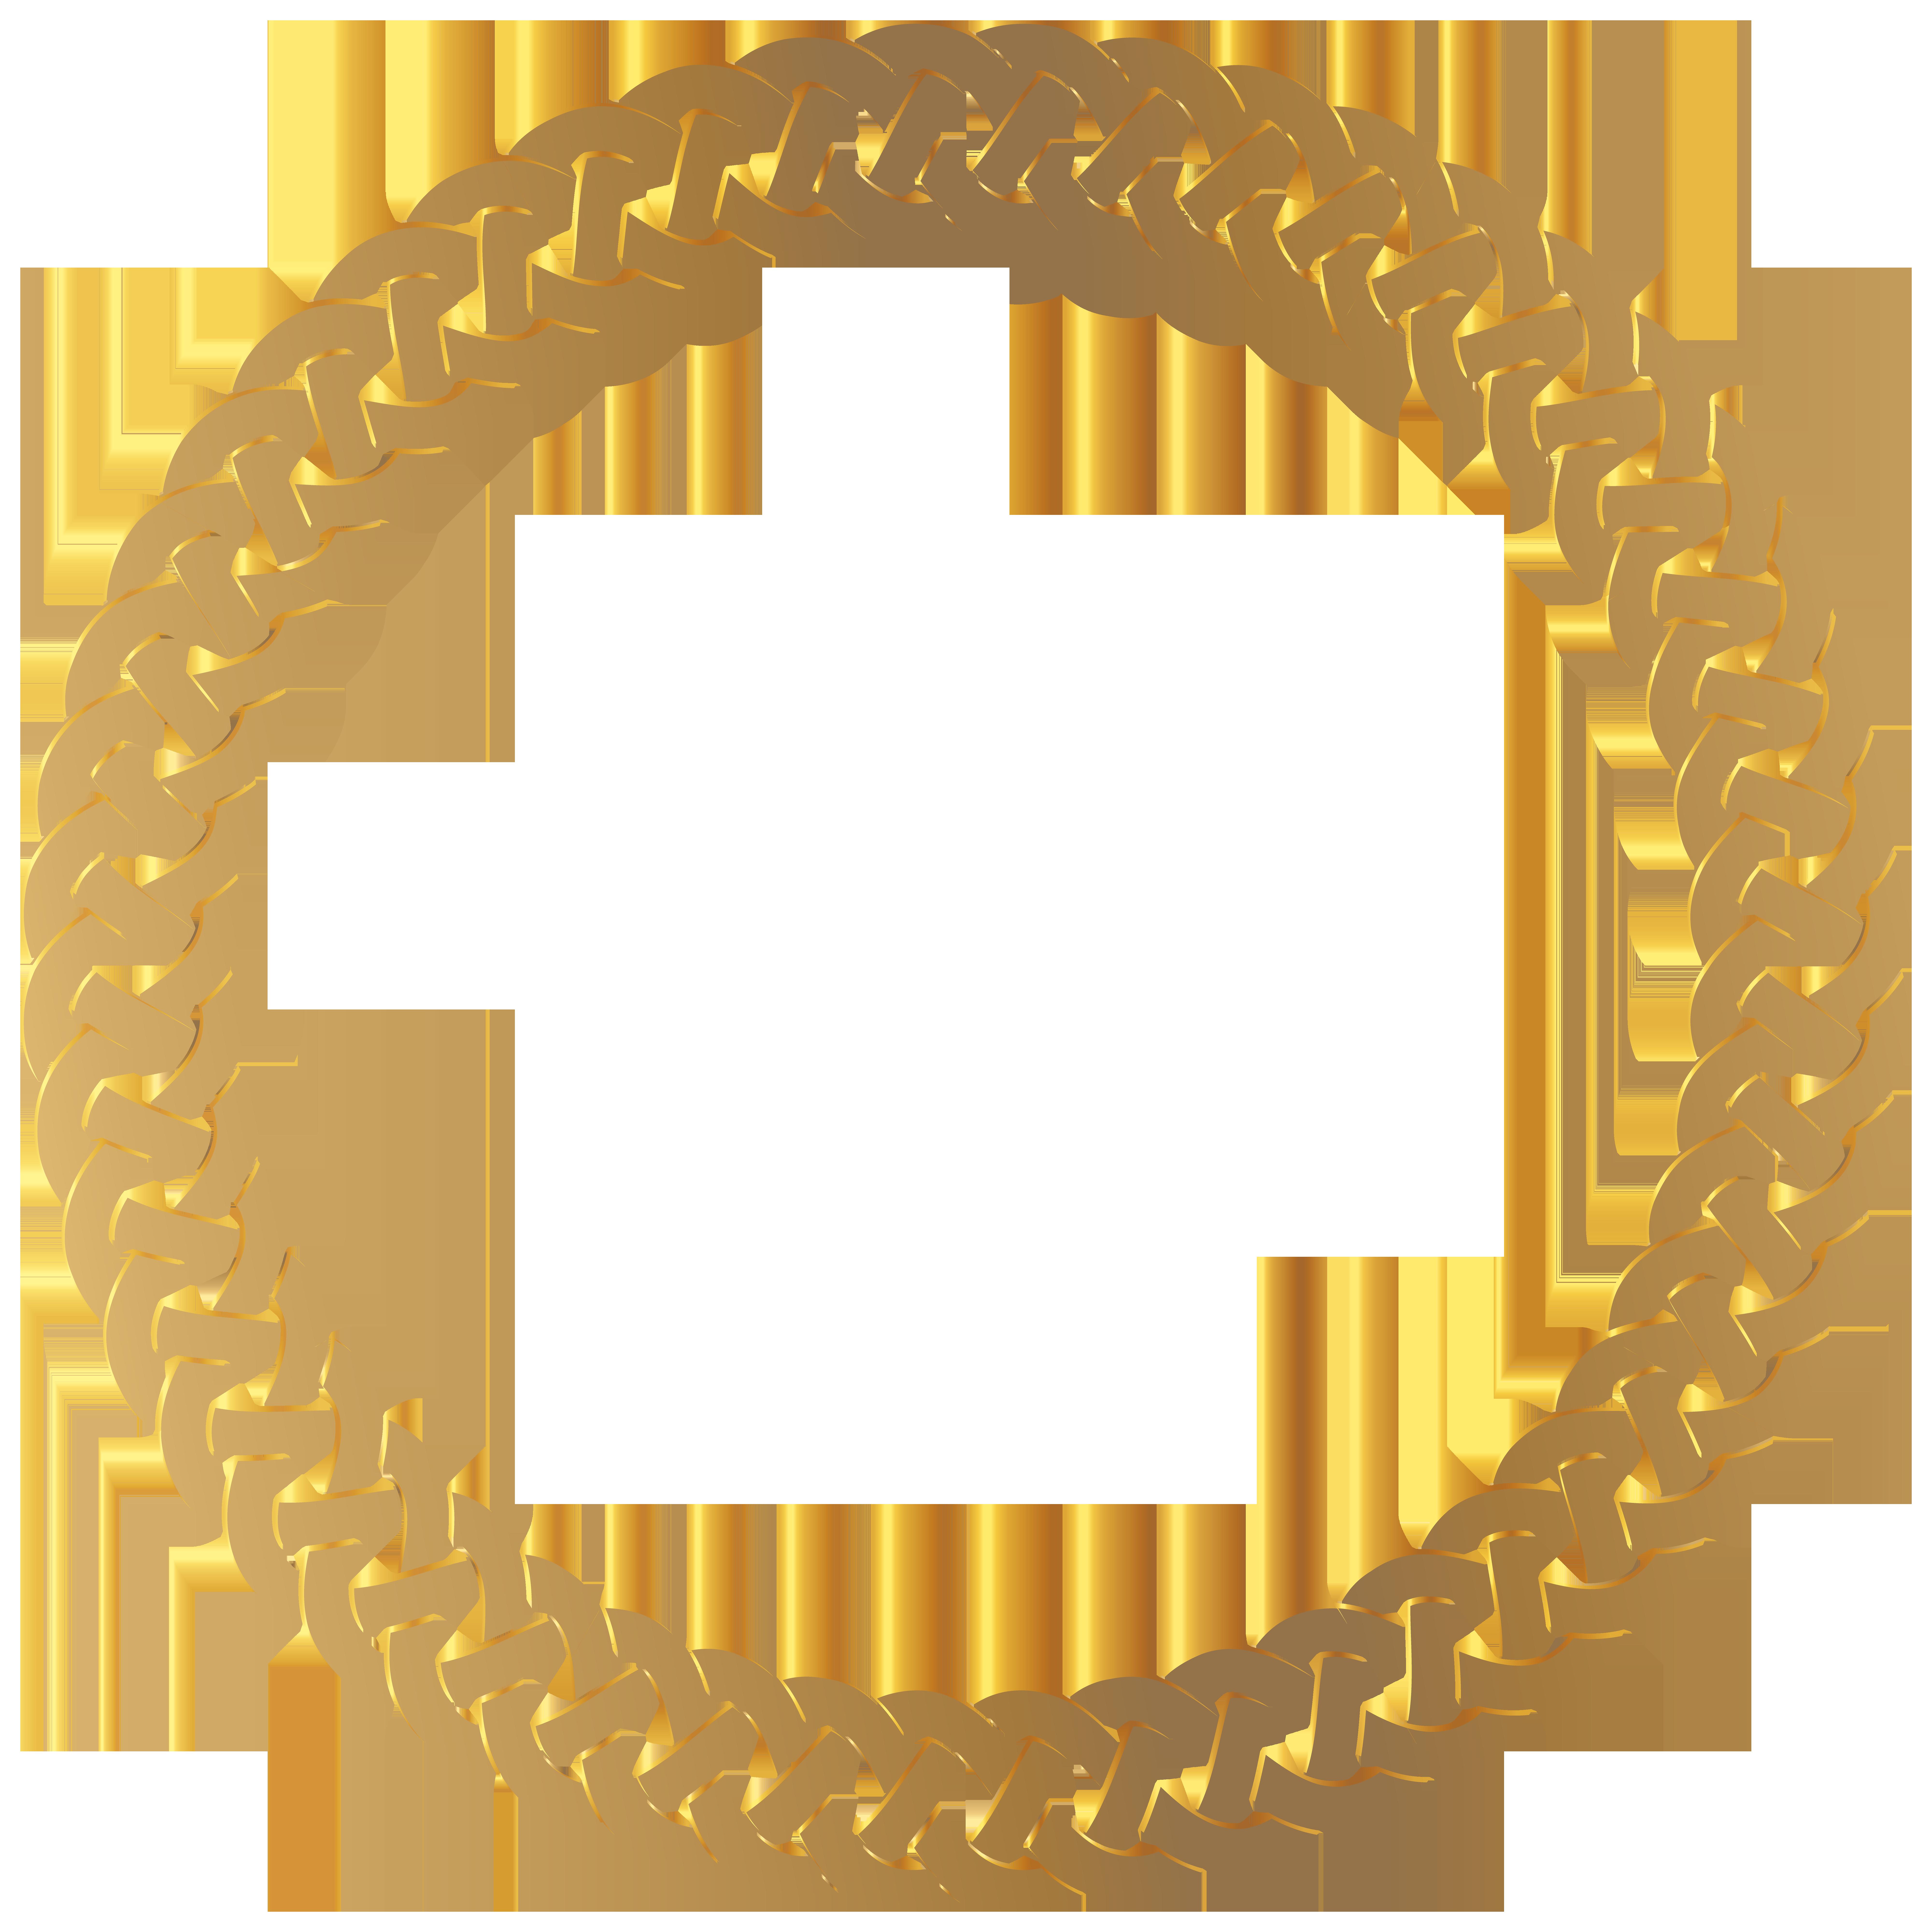 Golden Round Frame Border Transparent Png Clip Art Gallery Yopriceville High Quality Images And Transpa Gold Circle Frames Frame Border Design Round Frame